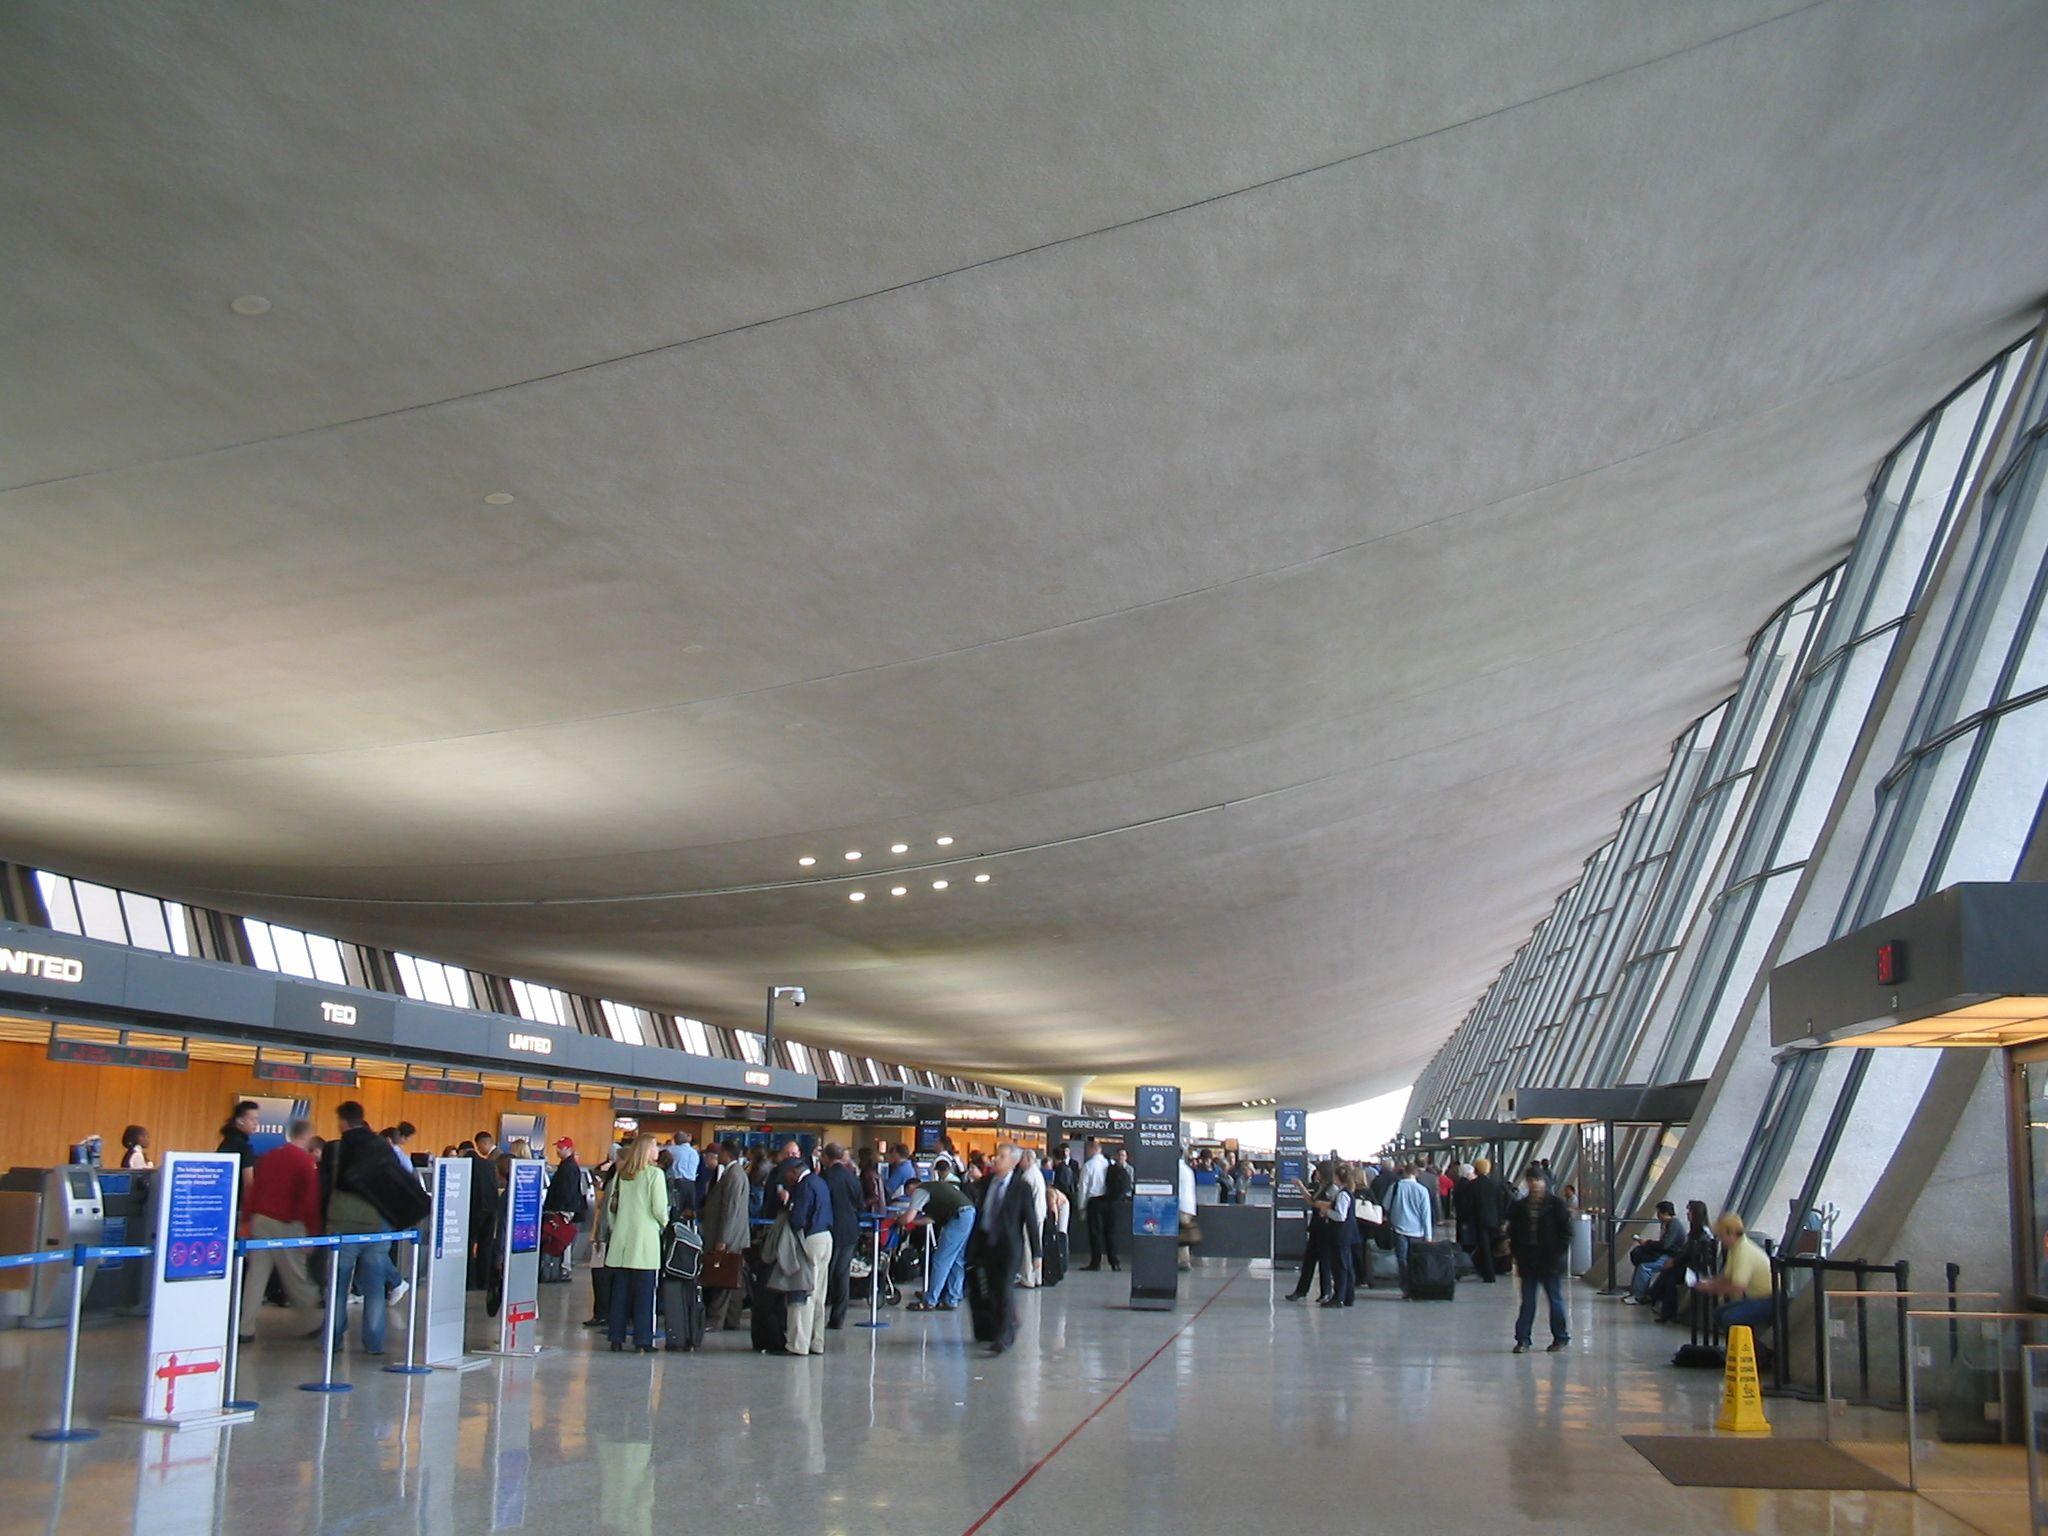 Washington Dulles International Airport Wikipedia, the